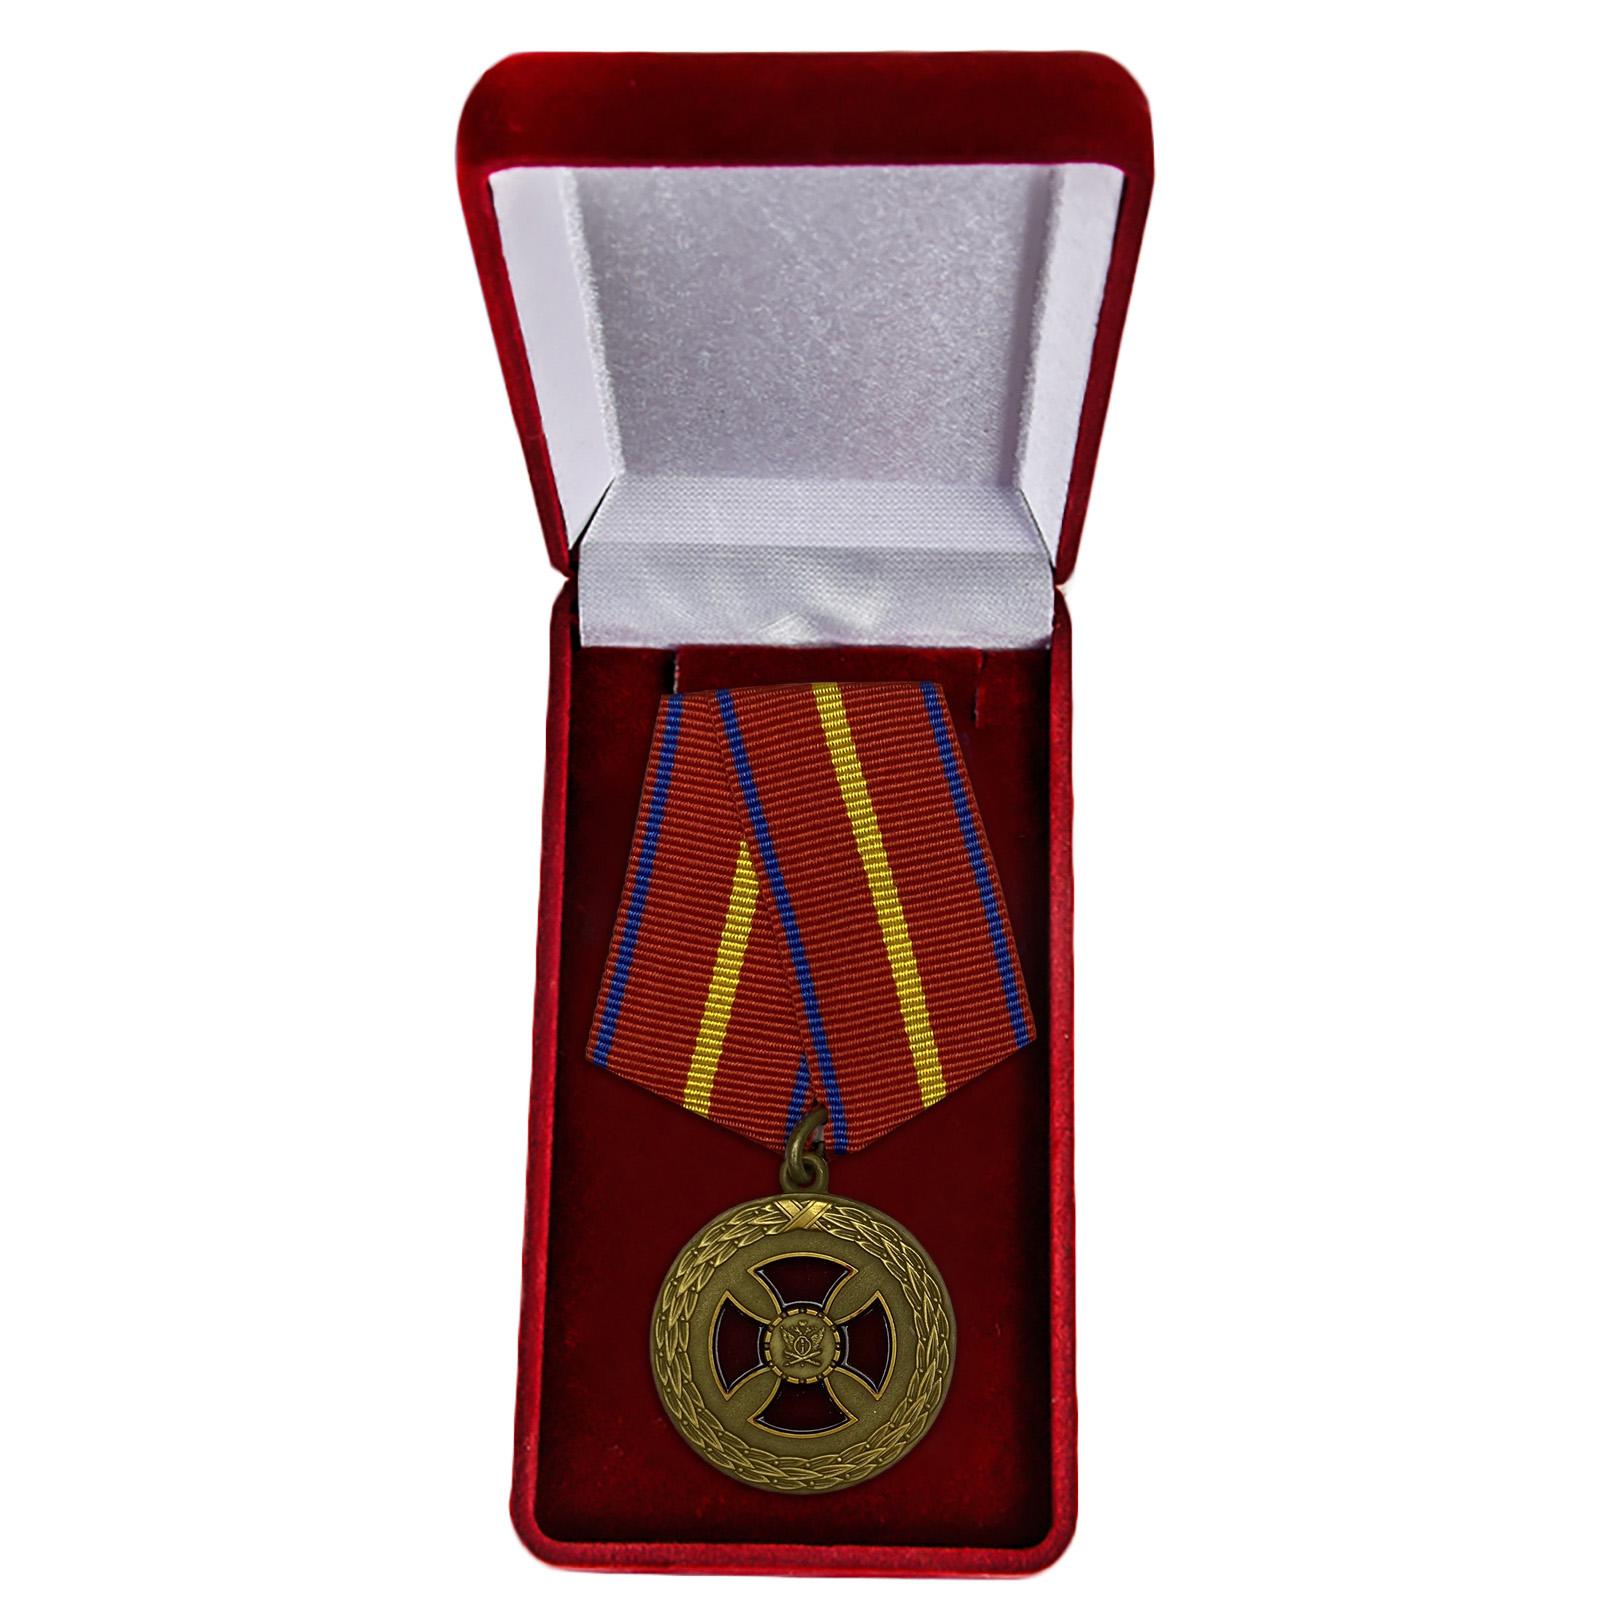 Медаль Министерства Юстиции За усердие 1 степени - в футляре